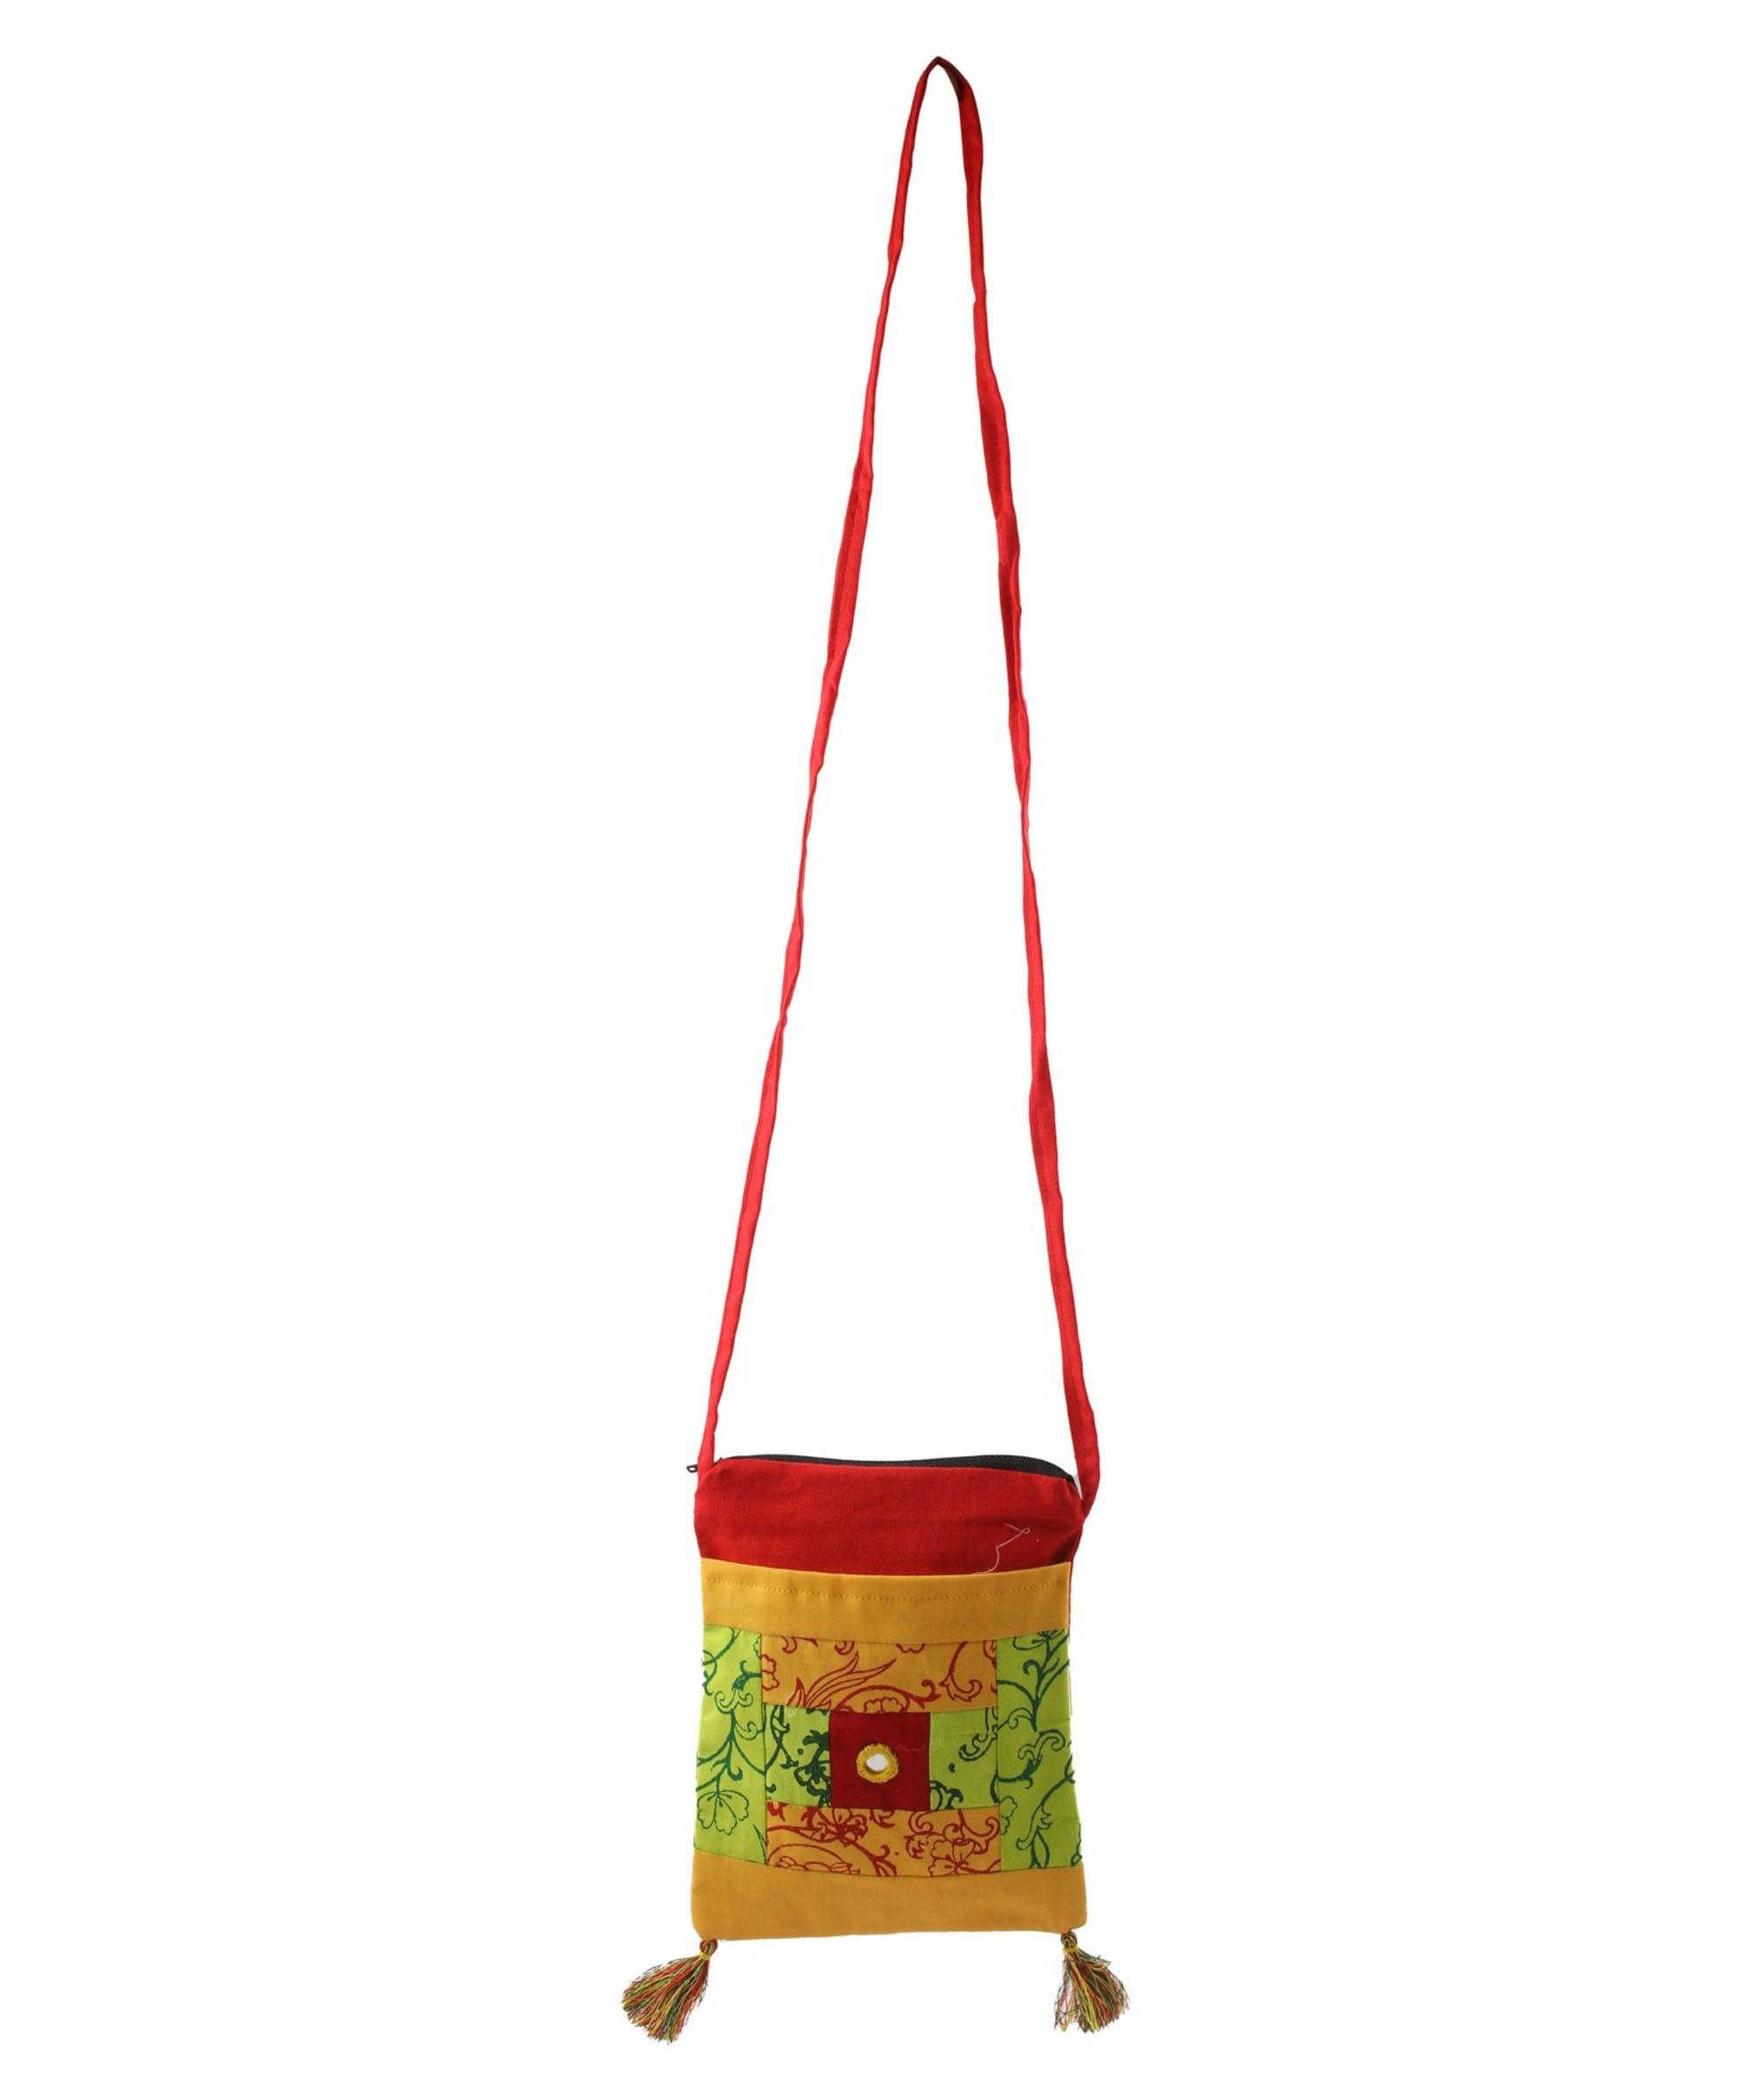 WIEA Turmeric Yellow Sling Bag (Set of 2) Slider 2/5